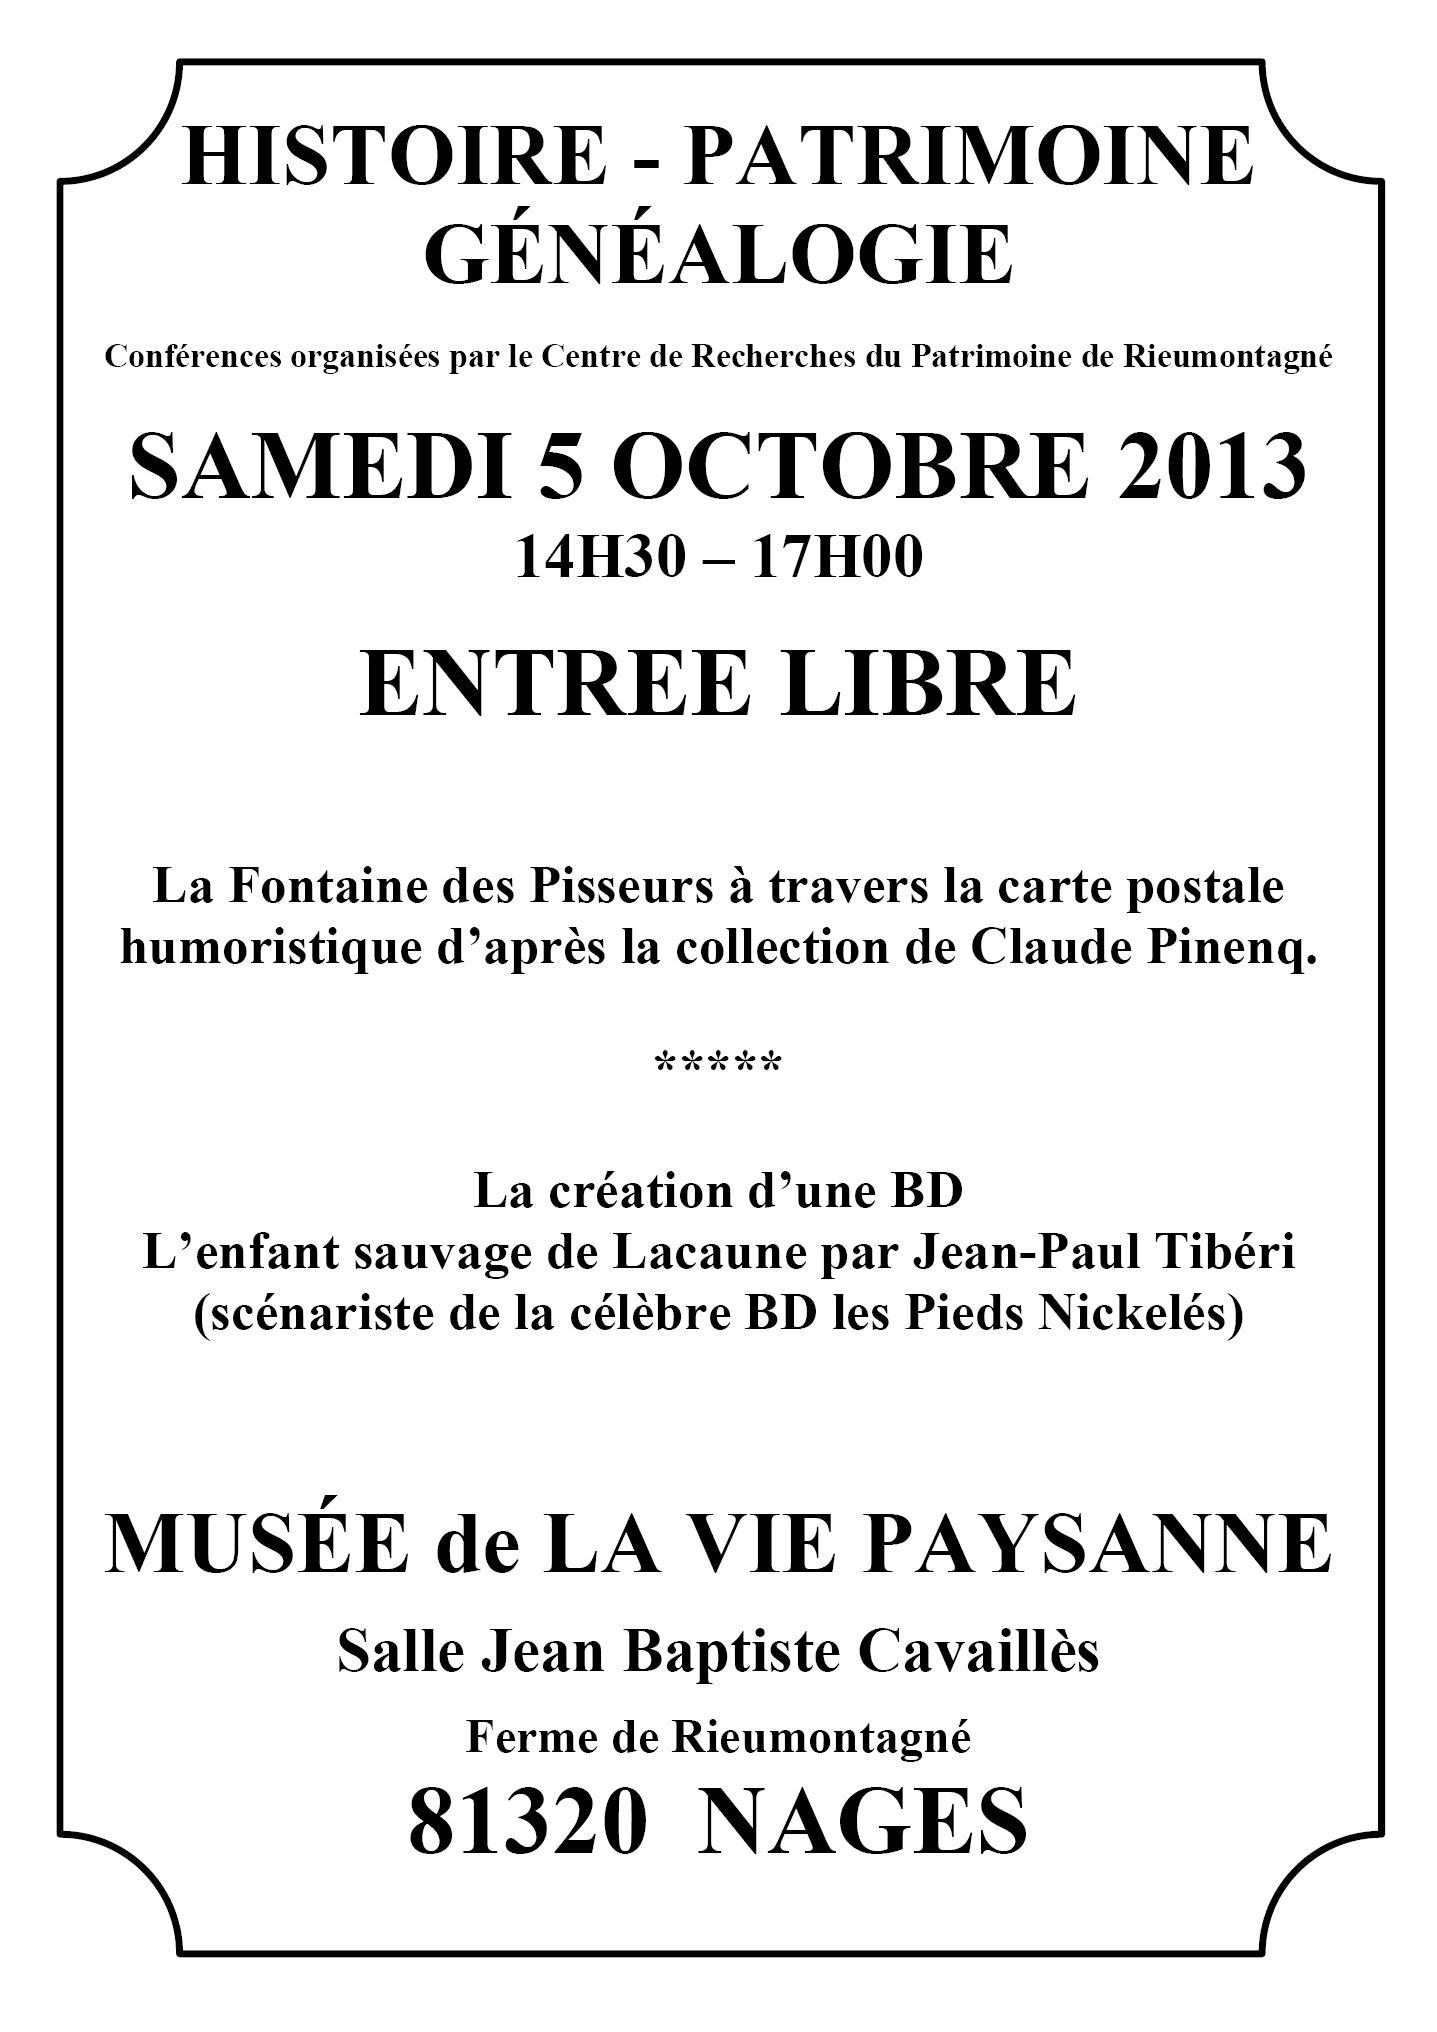 Samedi 5 octobre 2013 – Après-midi du patrimoine